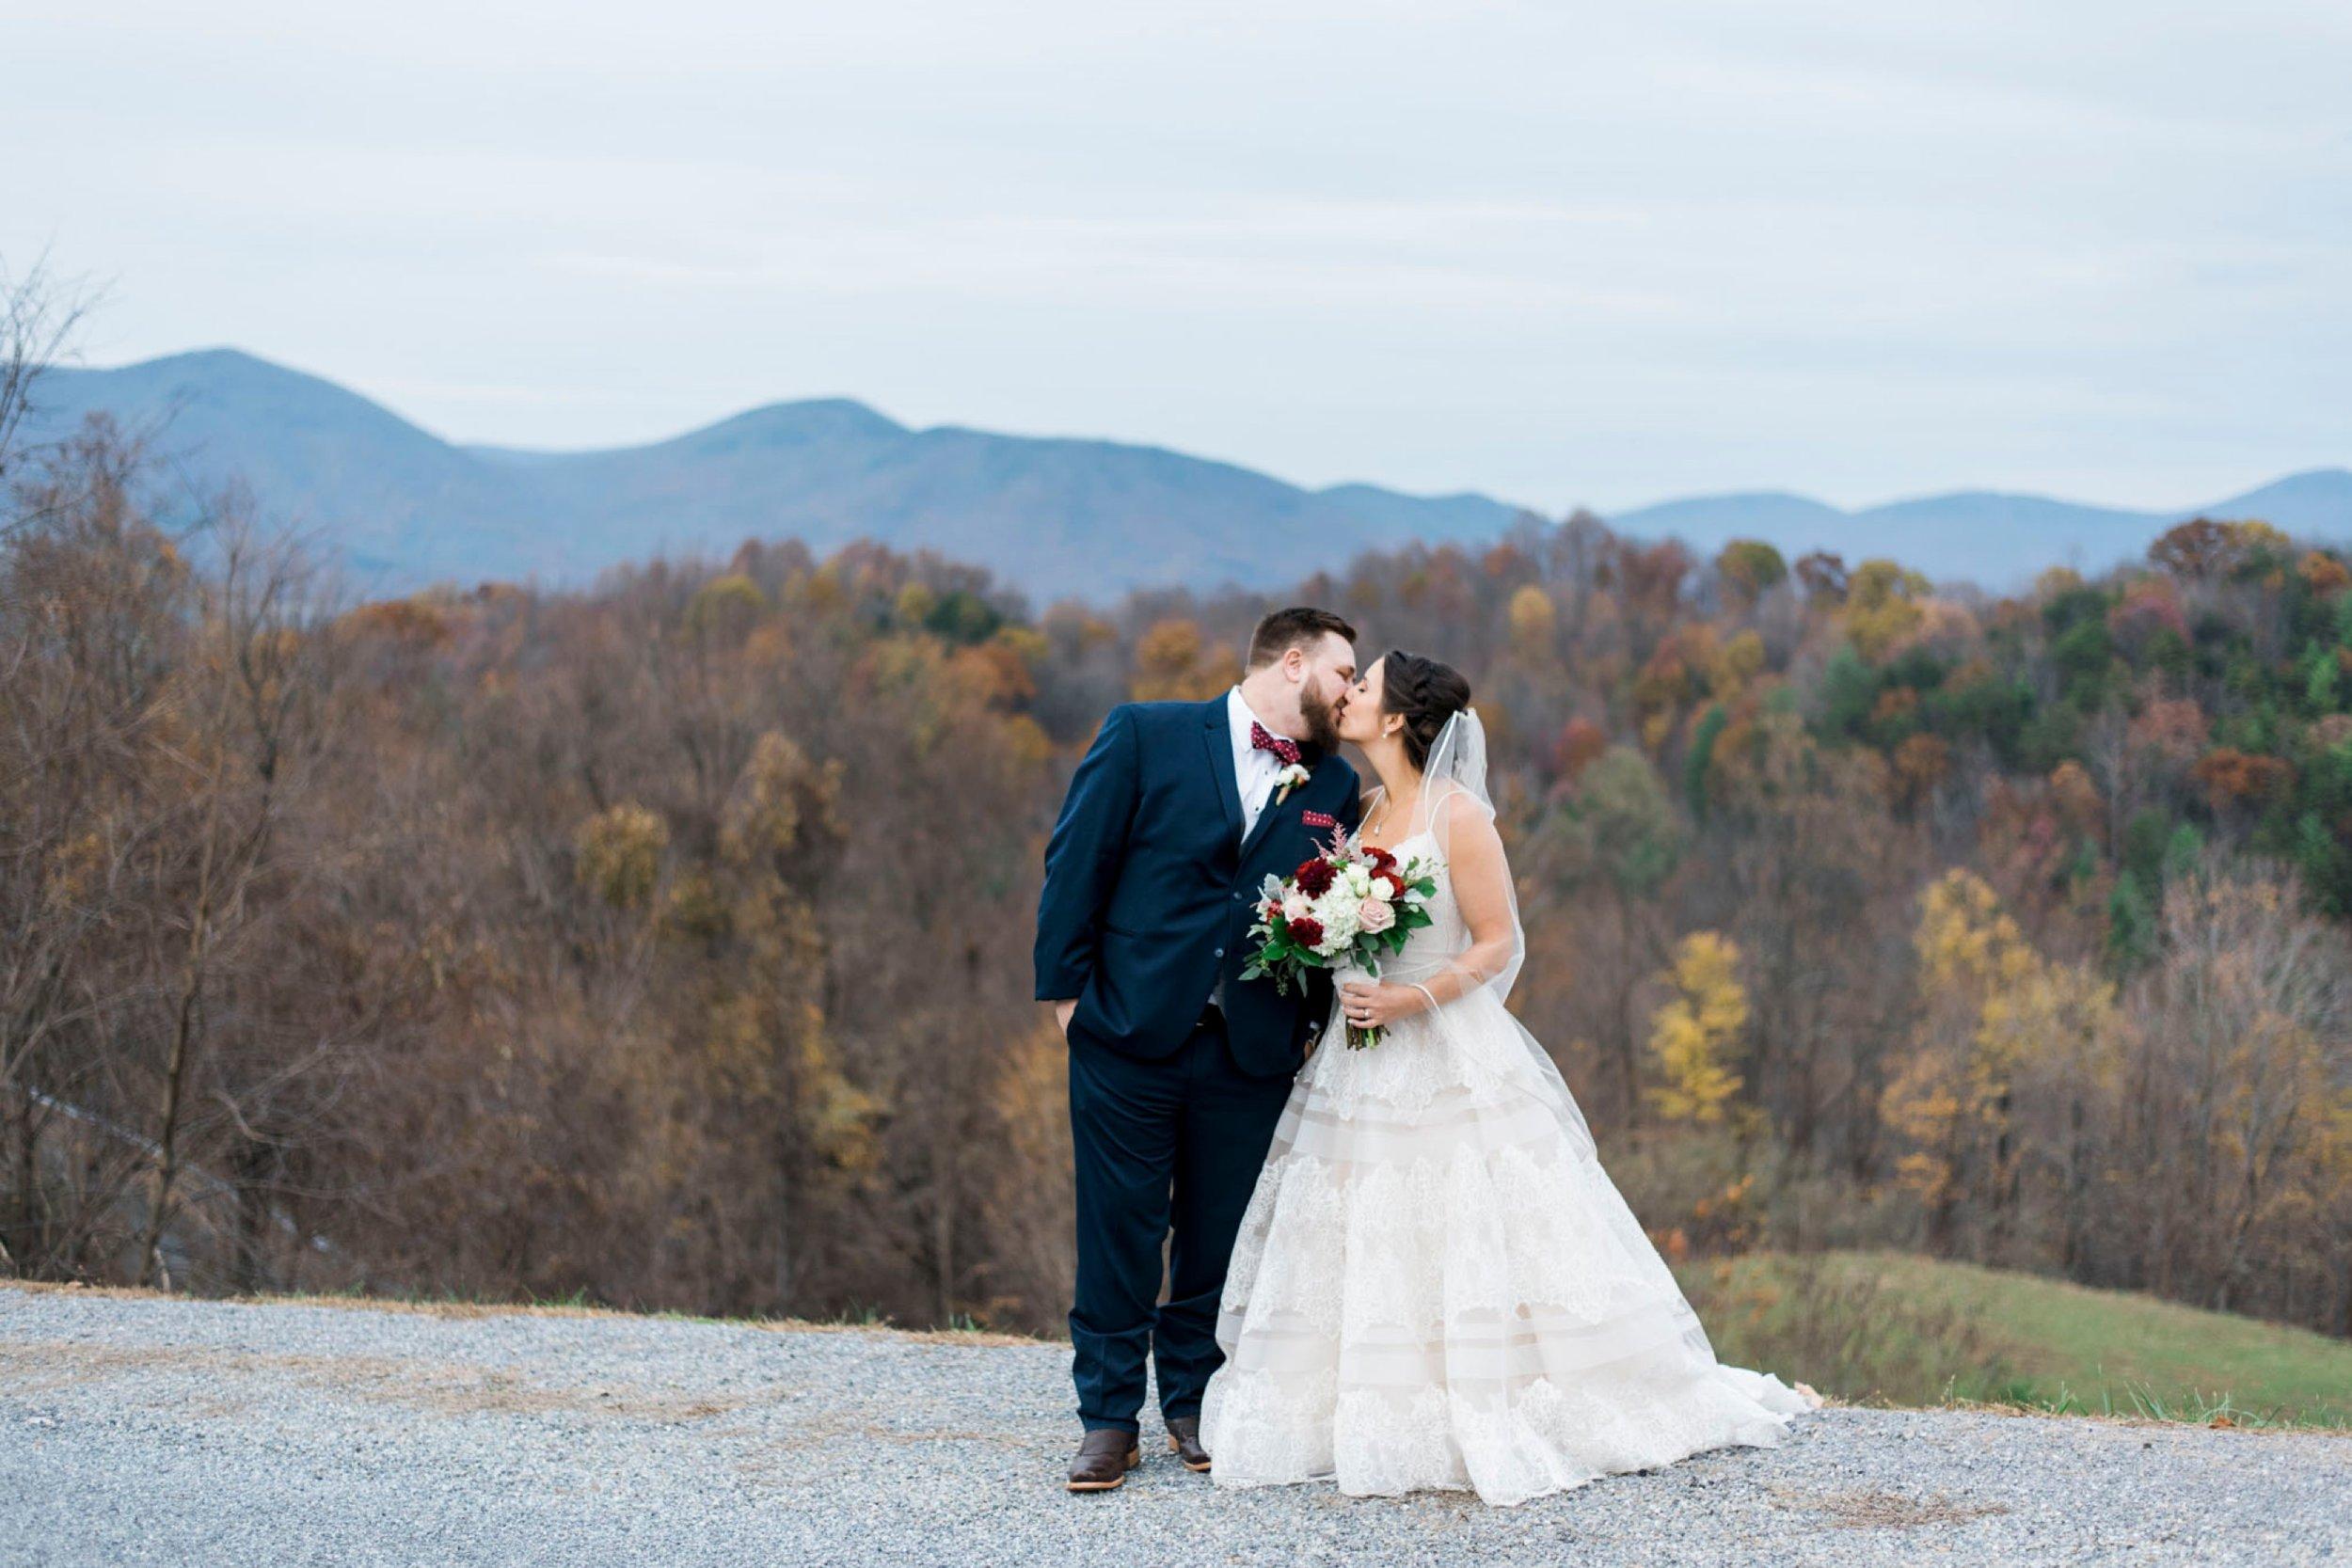 IrvineEstate_LexingtonVA_Wedding_FallWedding_VirginiaWeddingPhotographer 80.jpg